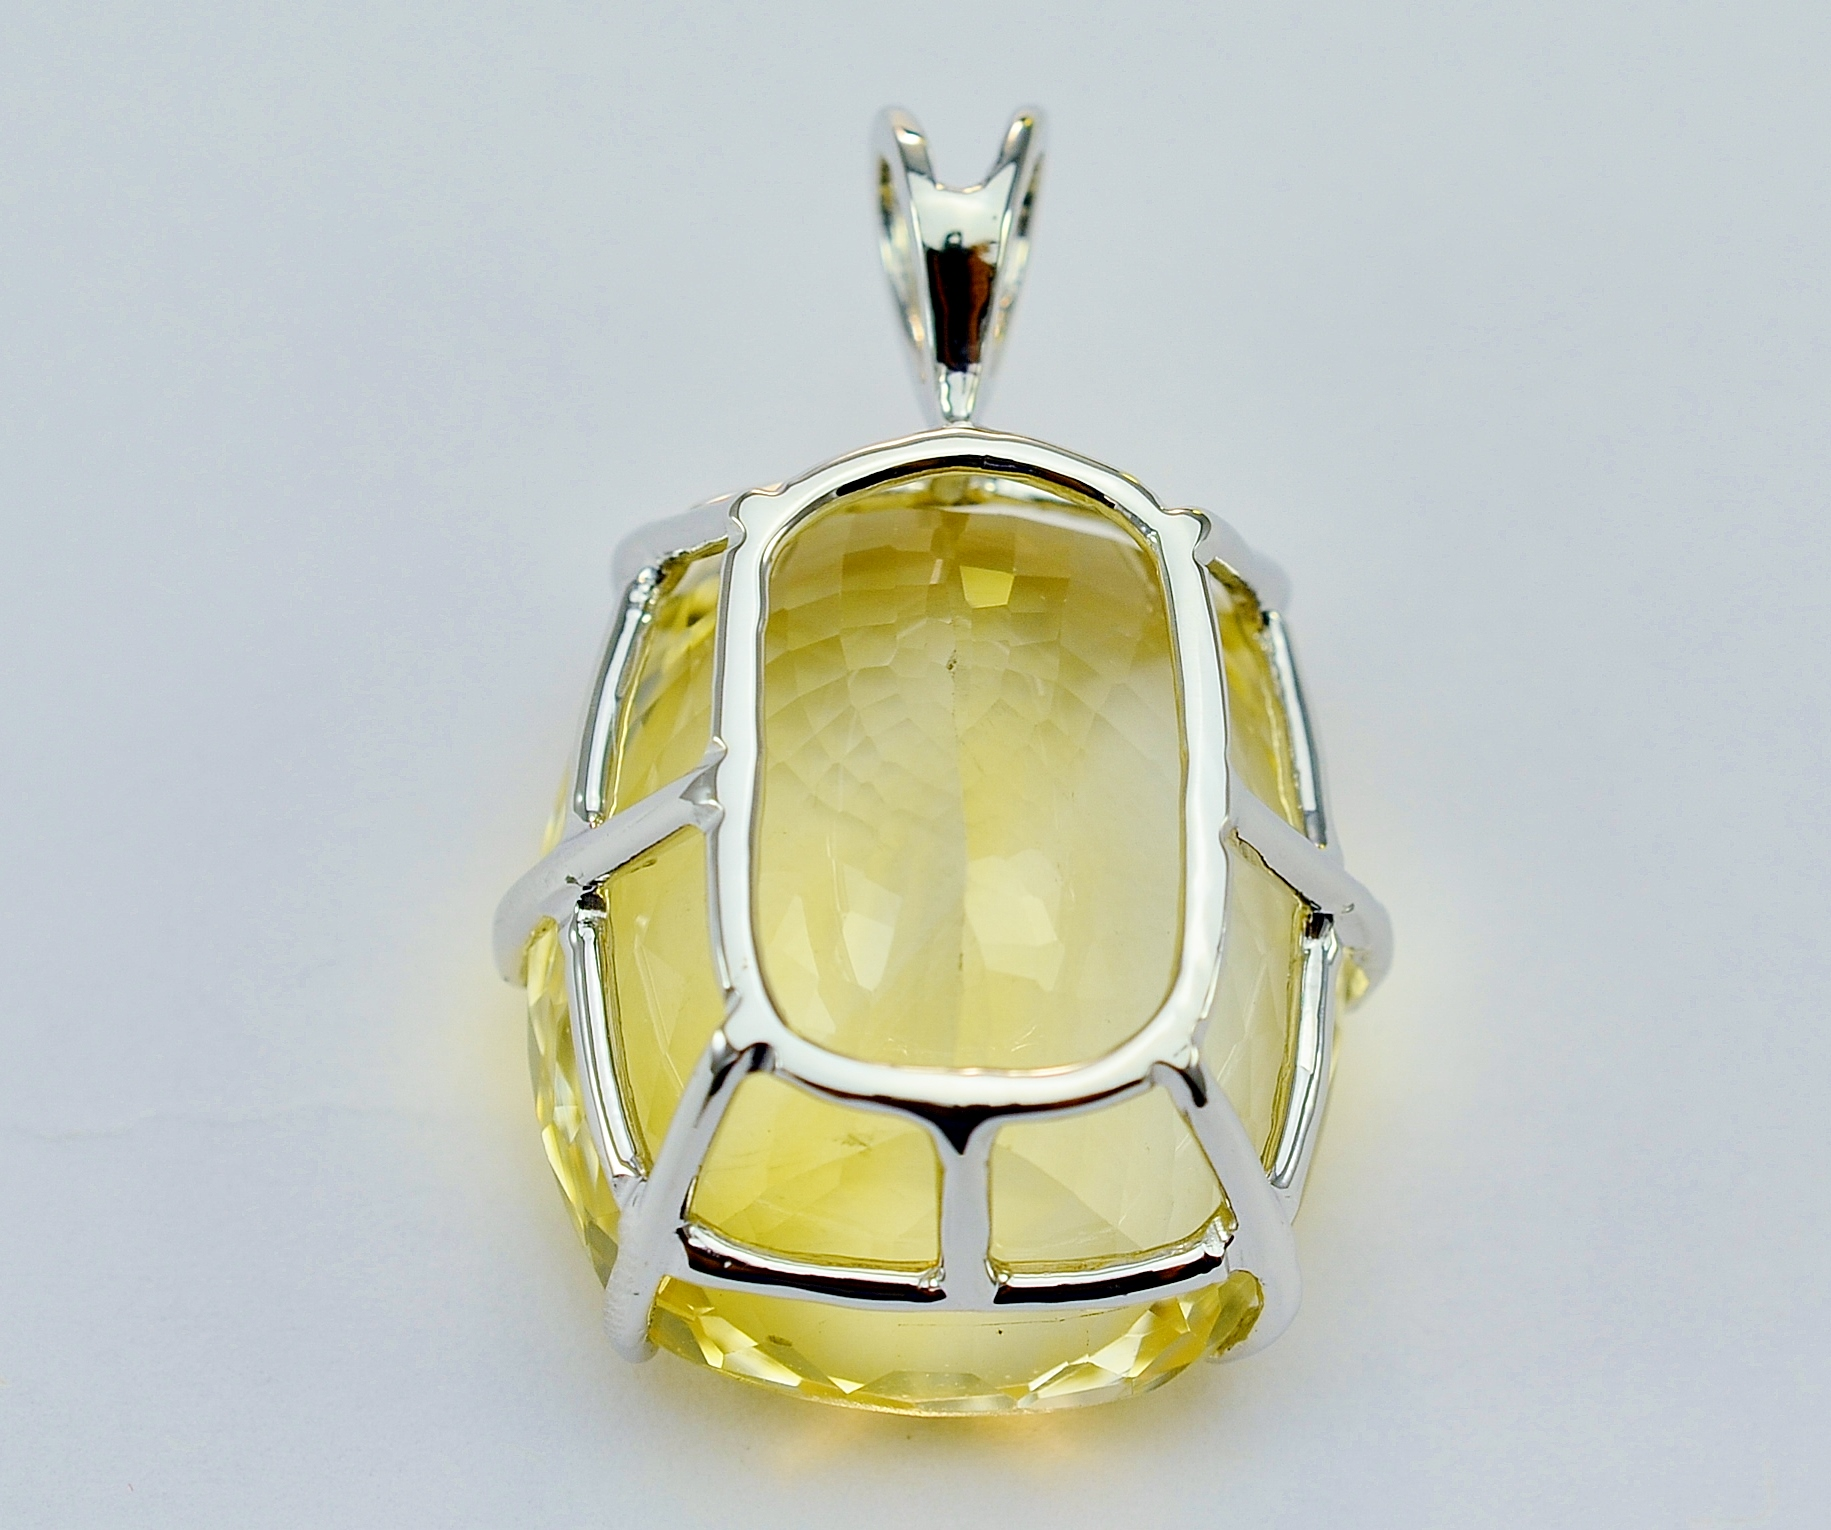 14K White Gold 73.33 Carats Yellow Topaz Large Pendant ...